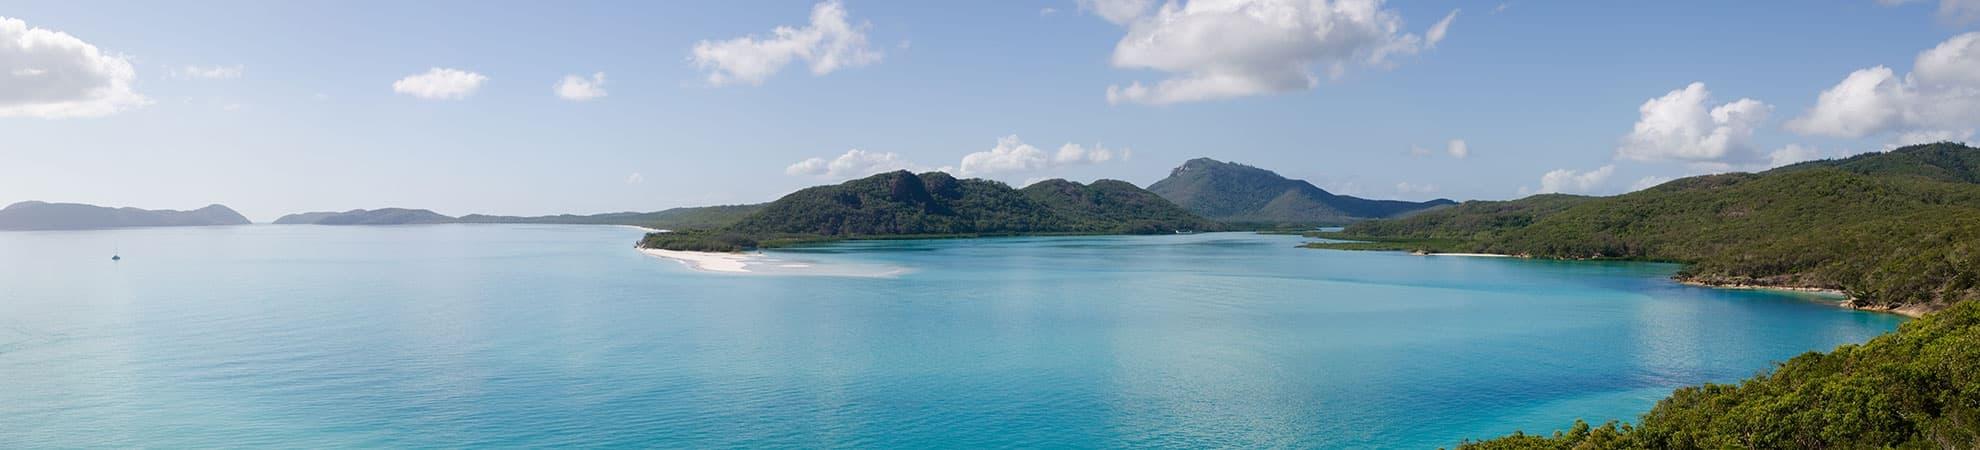 Voyage polynésie